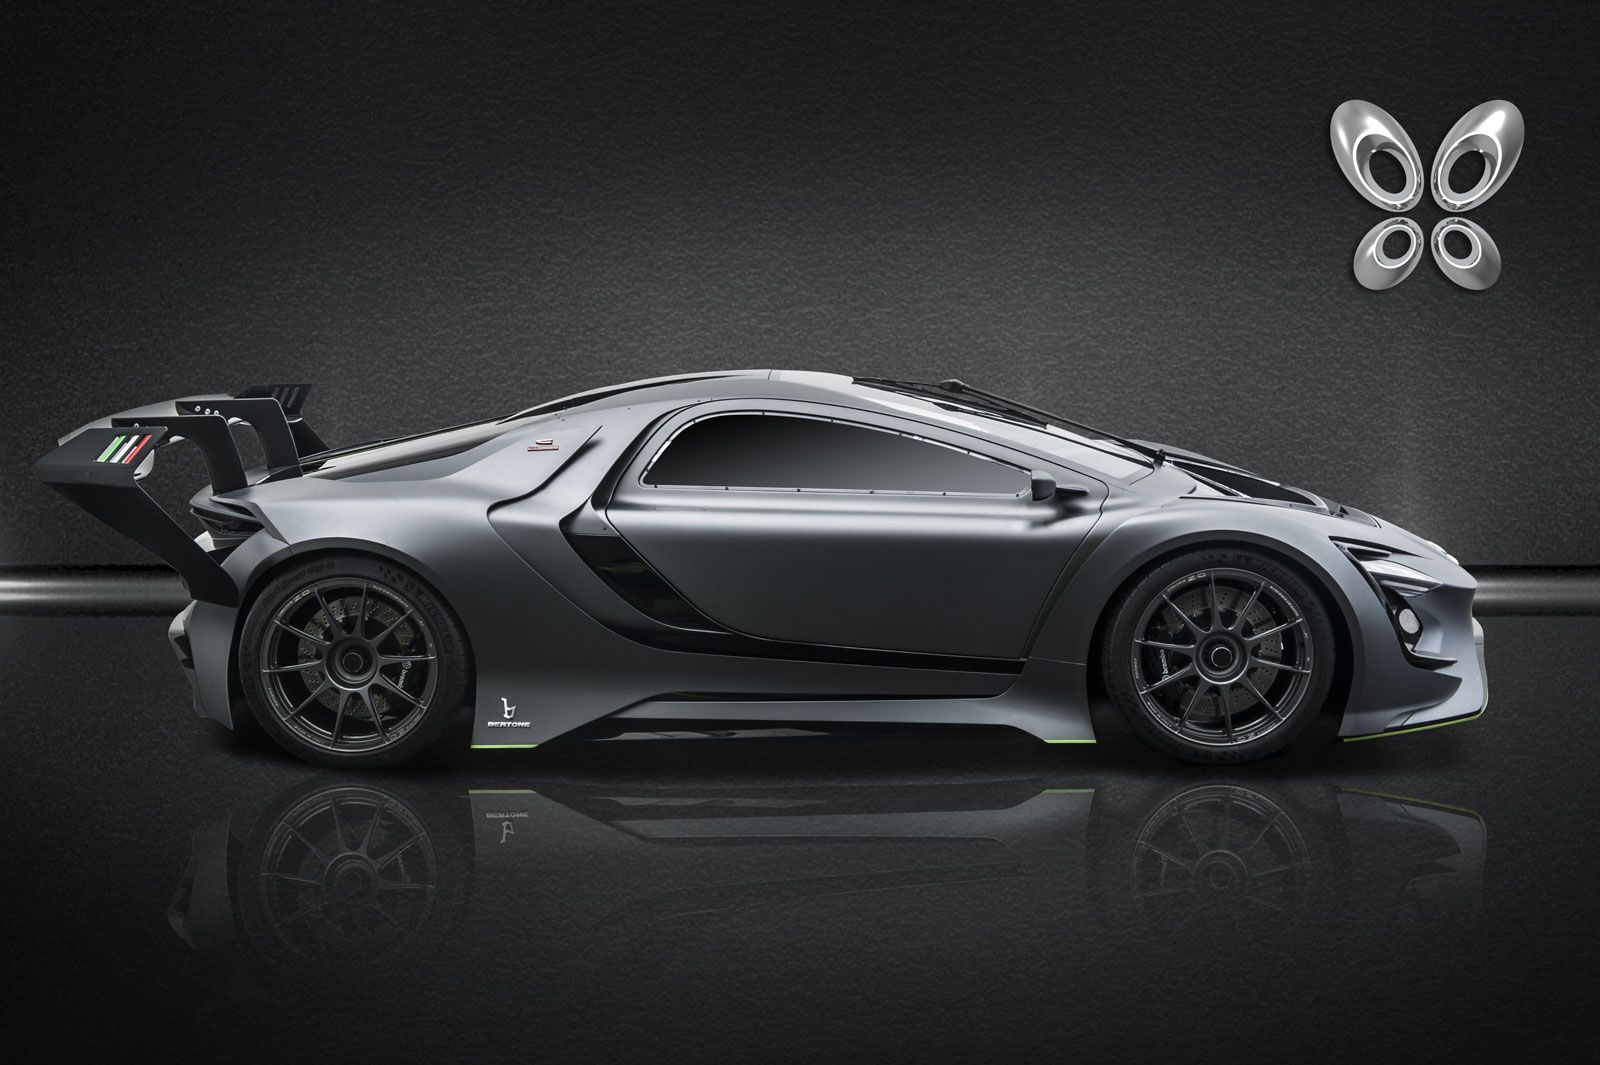 Dianche Bertone Bss Gt One Car Wallpapers Super Cars Car